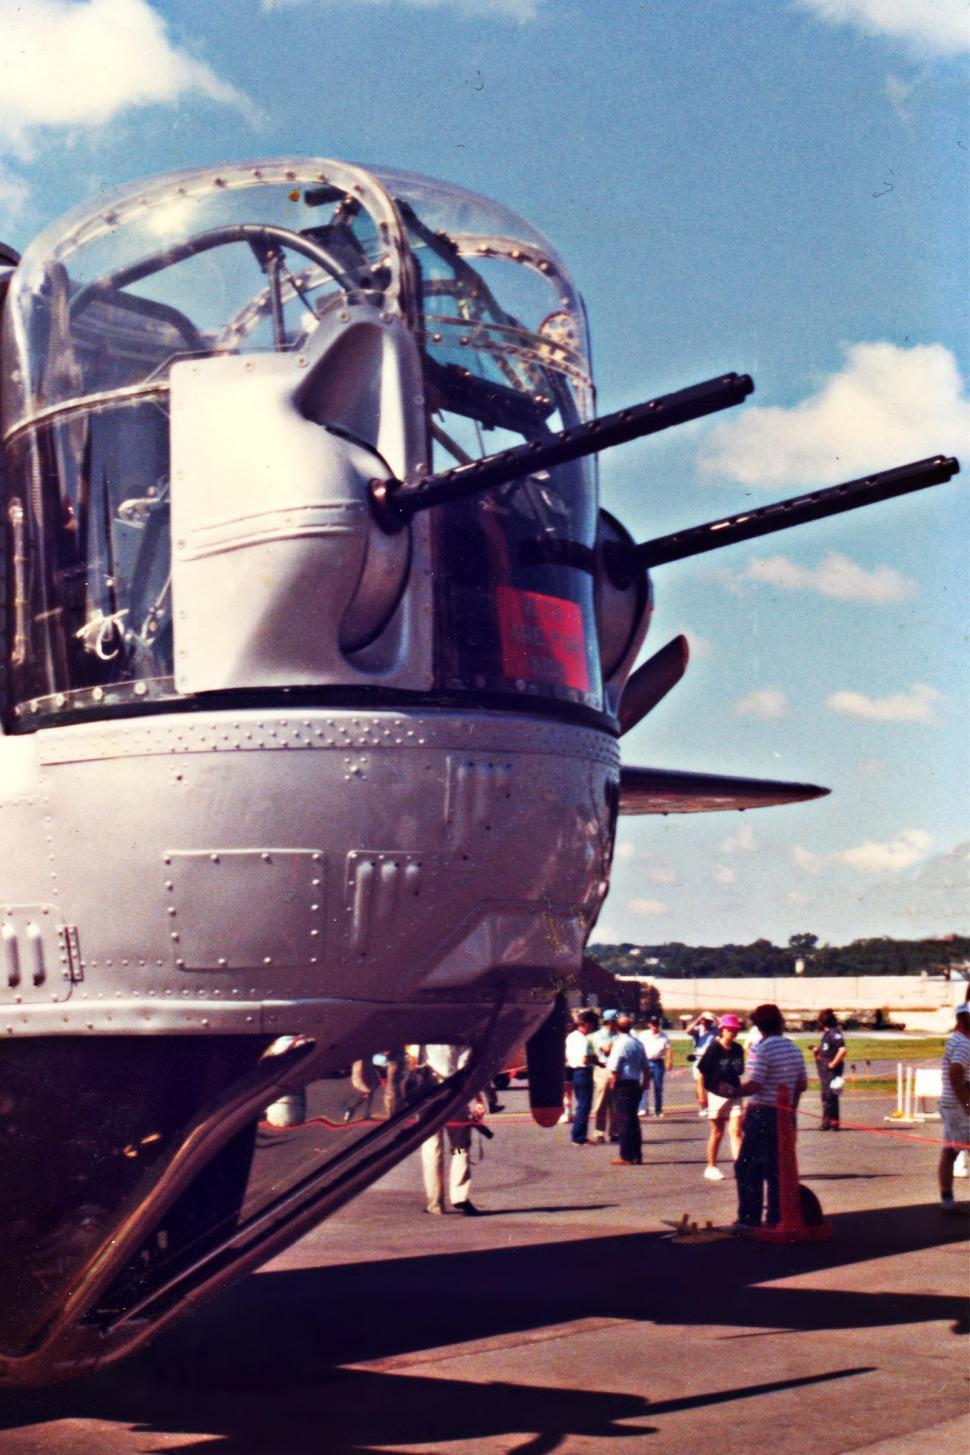 Download Free Stock Photo of B-24 Liberator bomber nose turret